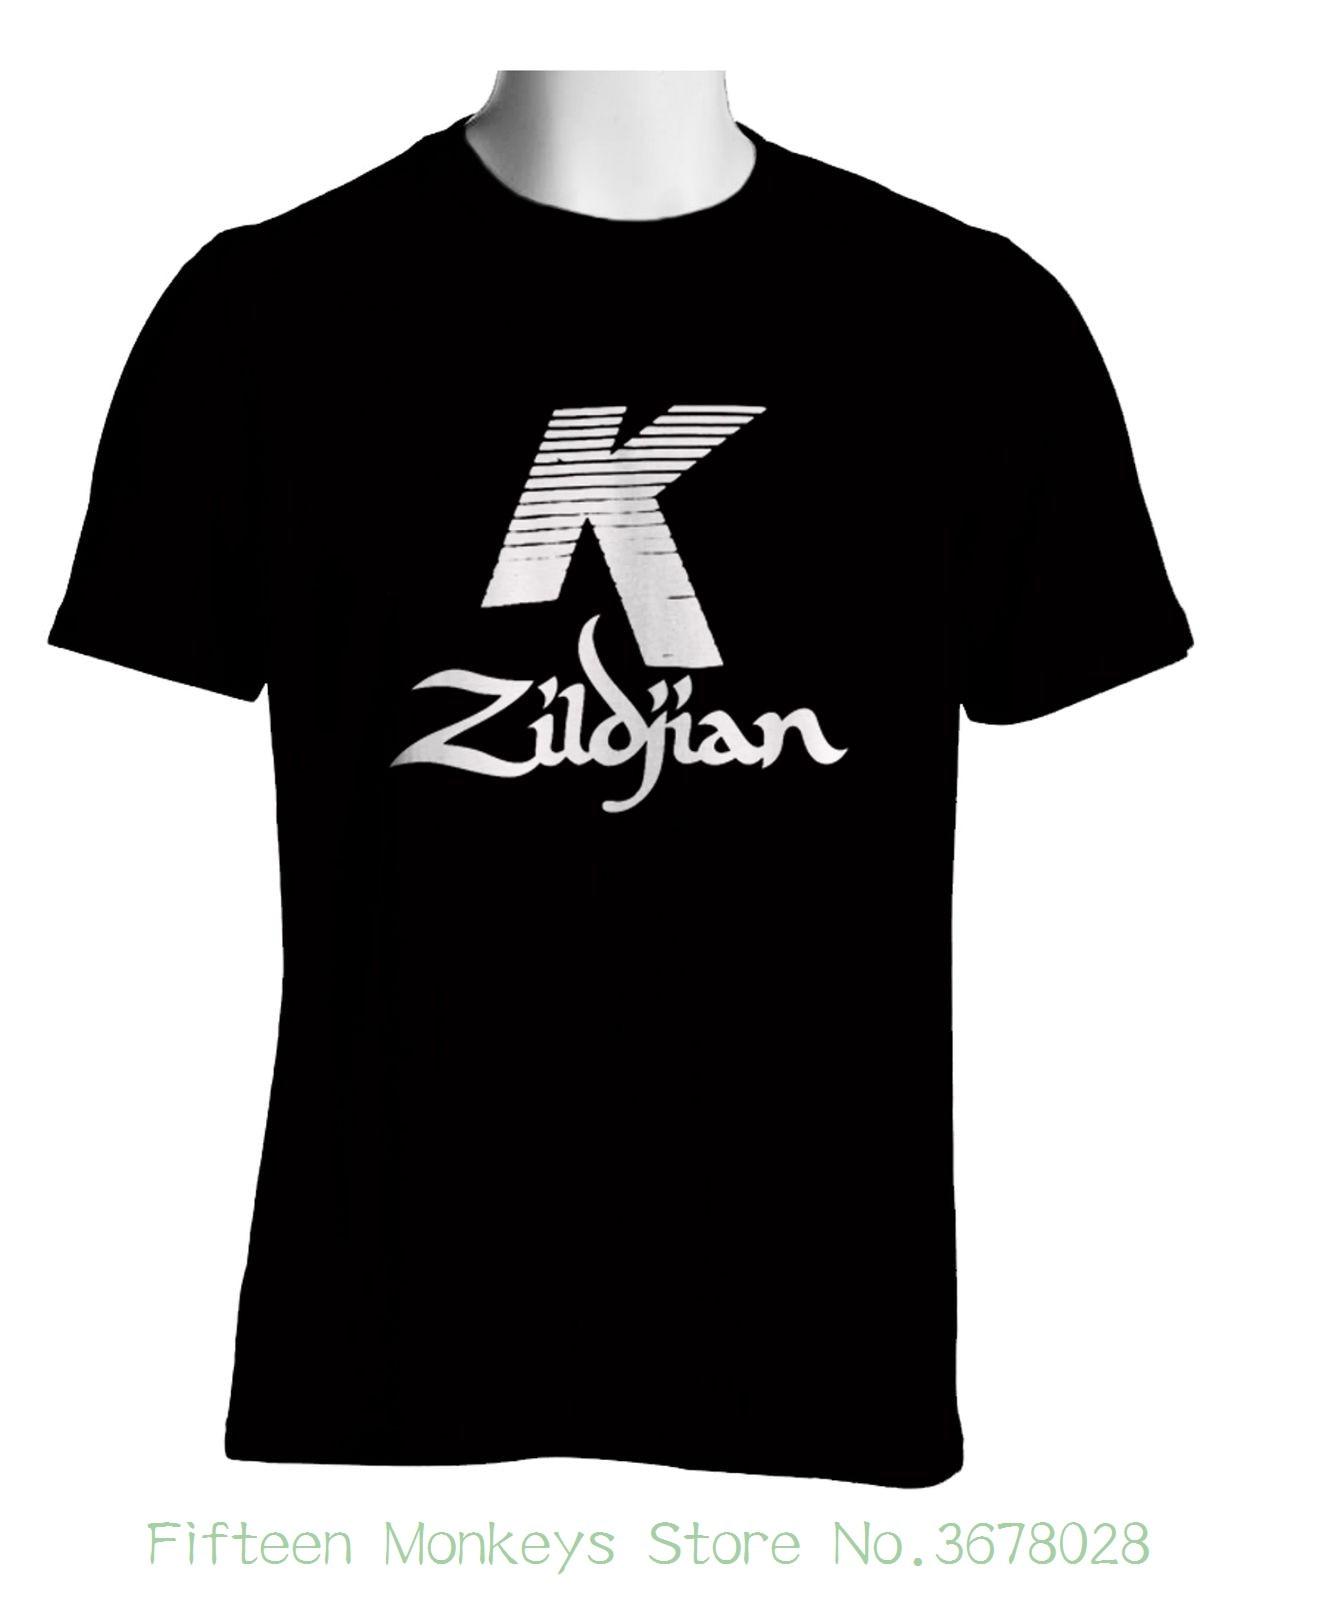 Casual Man Tees Mens Tops Zildjian K Percussion Drums Cymbal Logo Black T-shirt Mens Tshirt S To 3xl